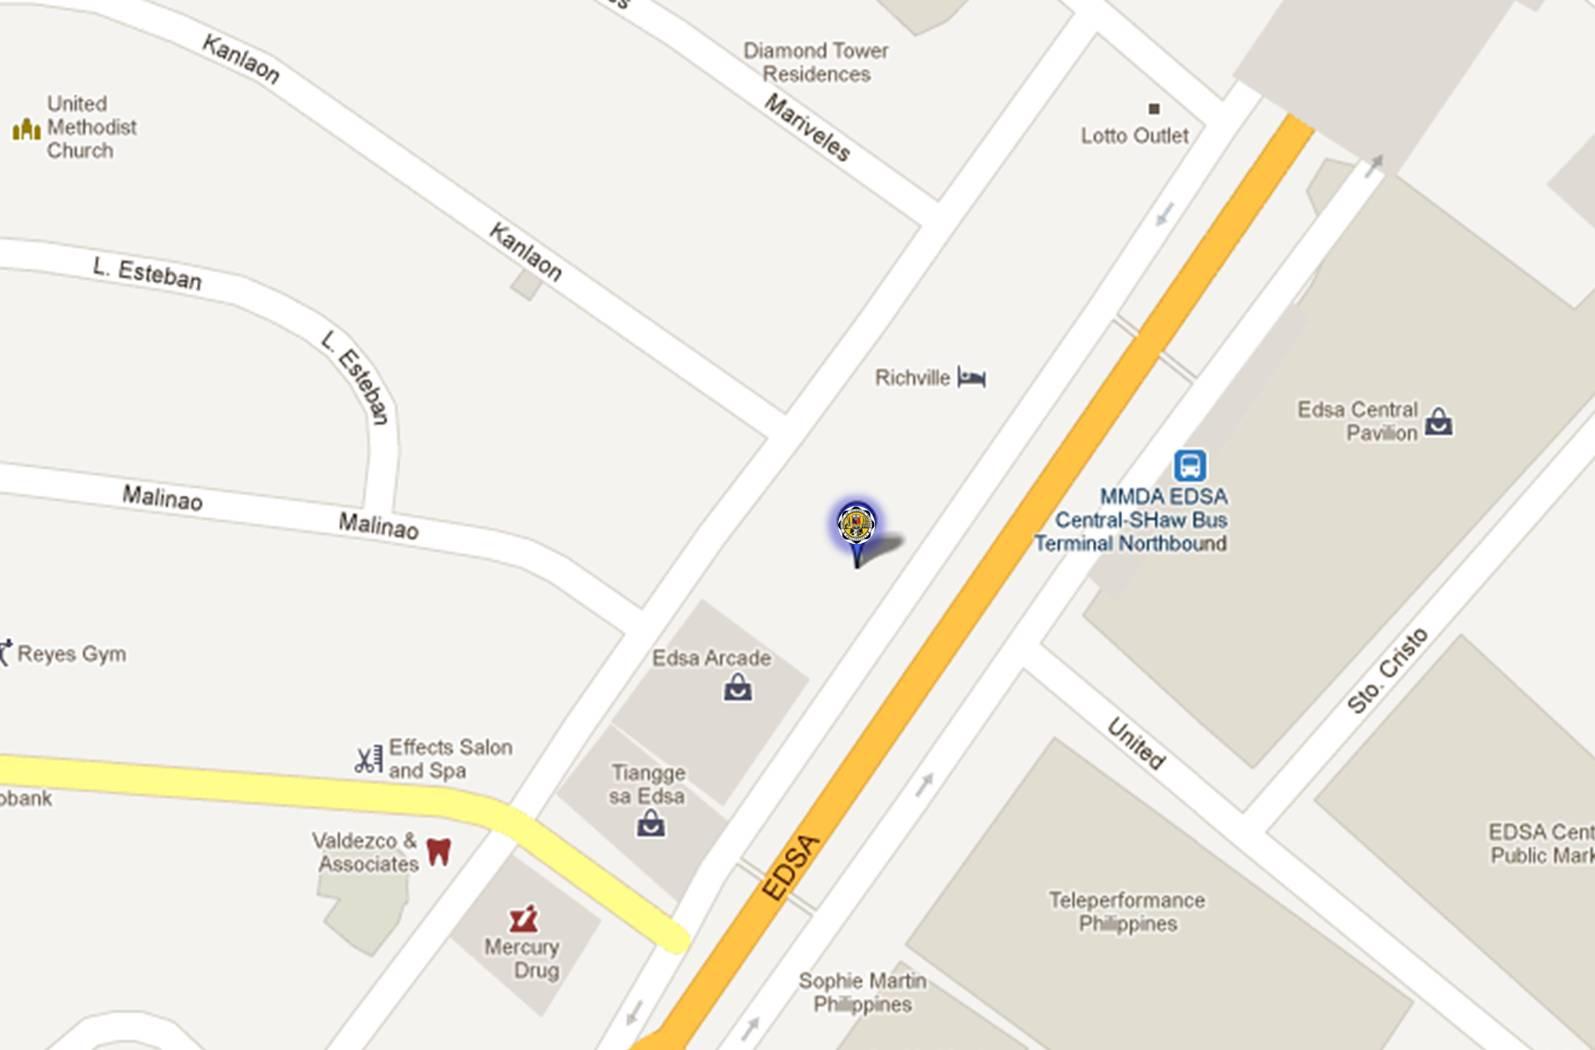 Tomtax RDO Mandaluyong Cithy Map Location - Mandaluyong map